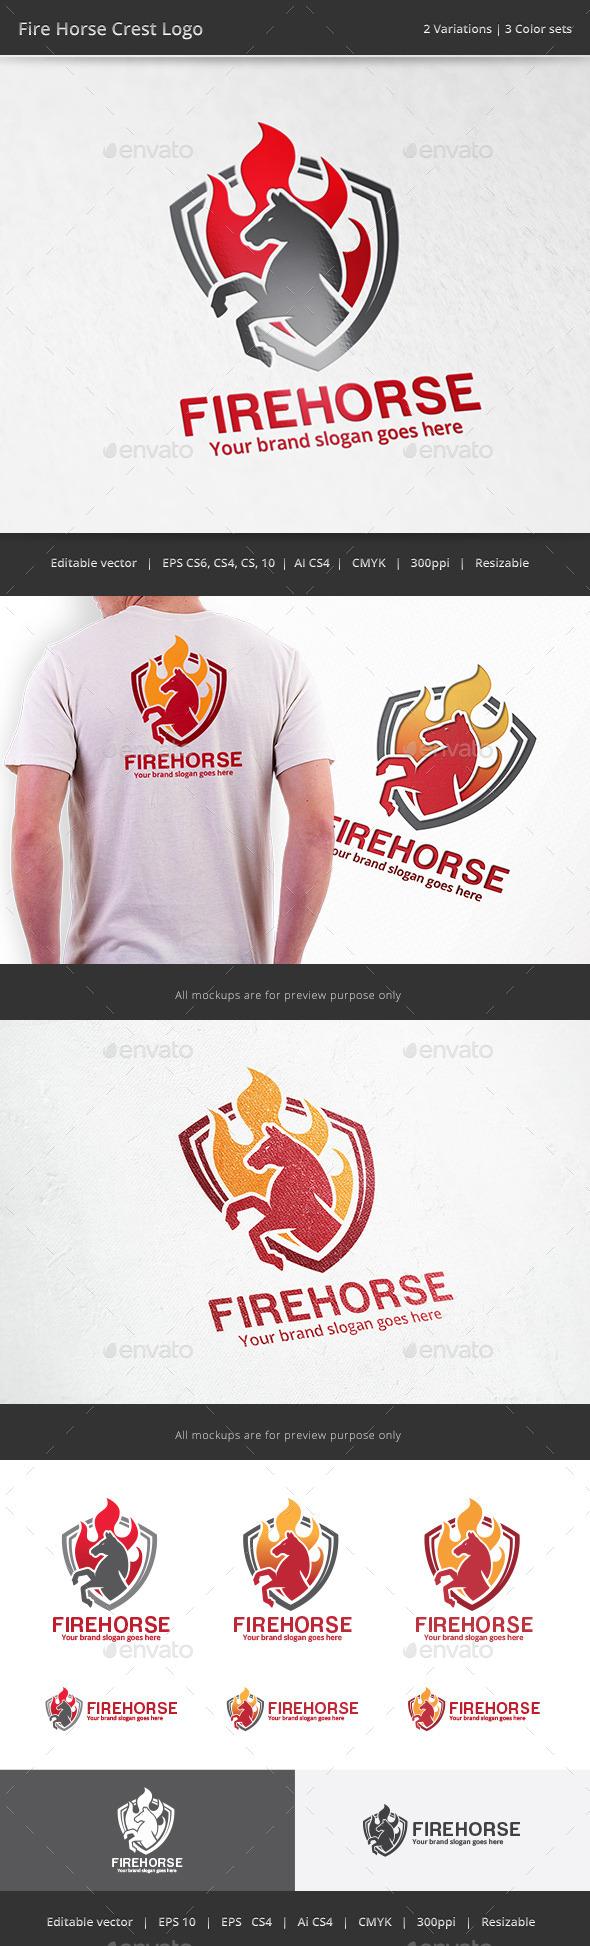 GraphicRiver Fire Horse Crest Logo 11906940